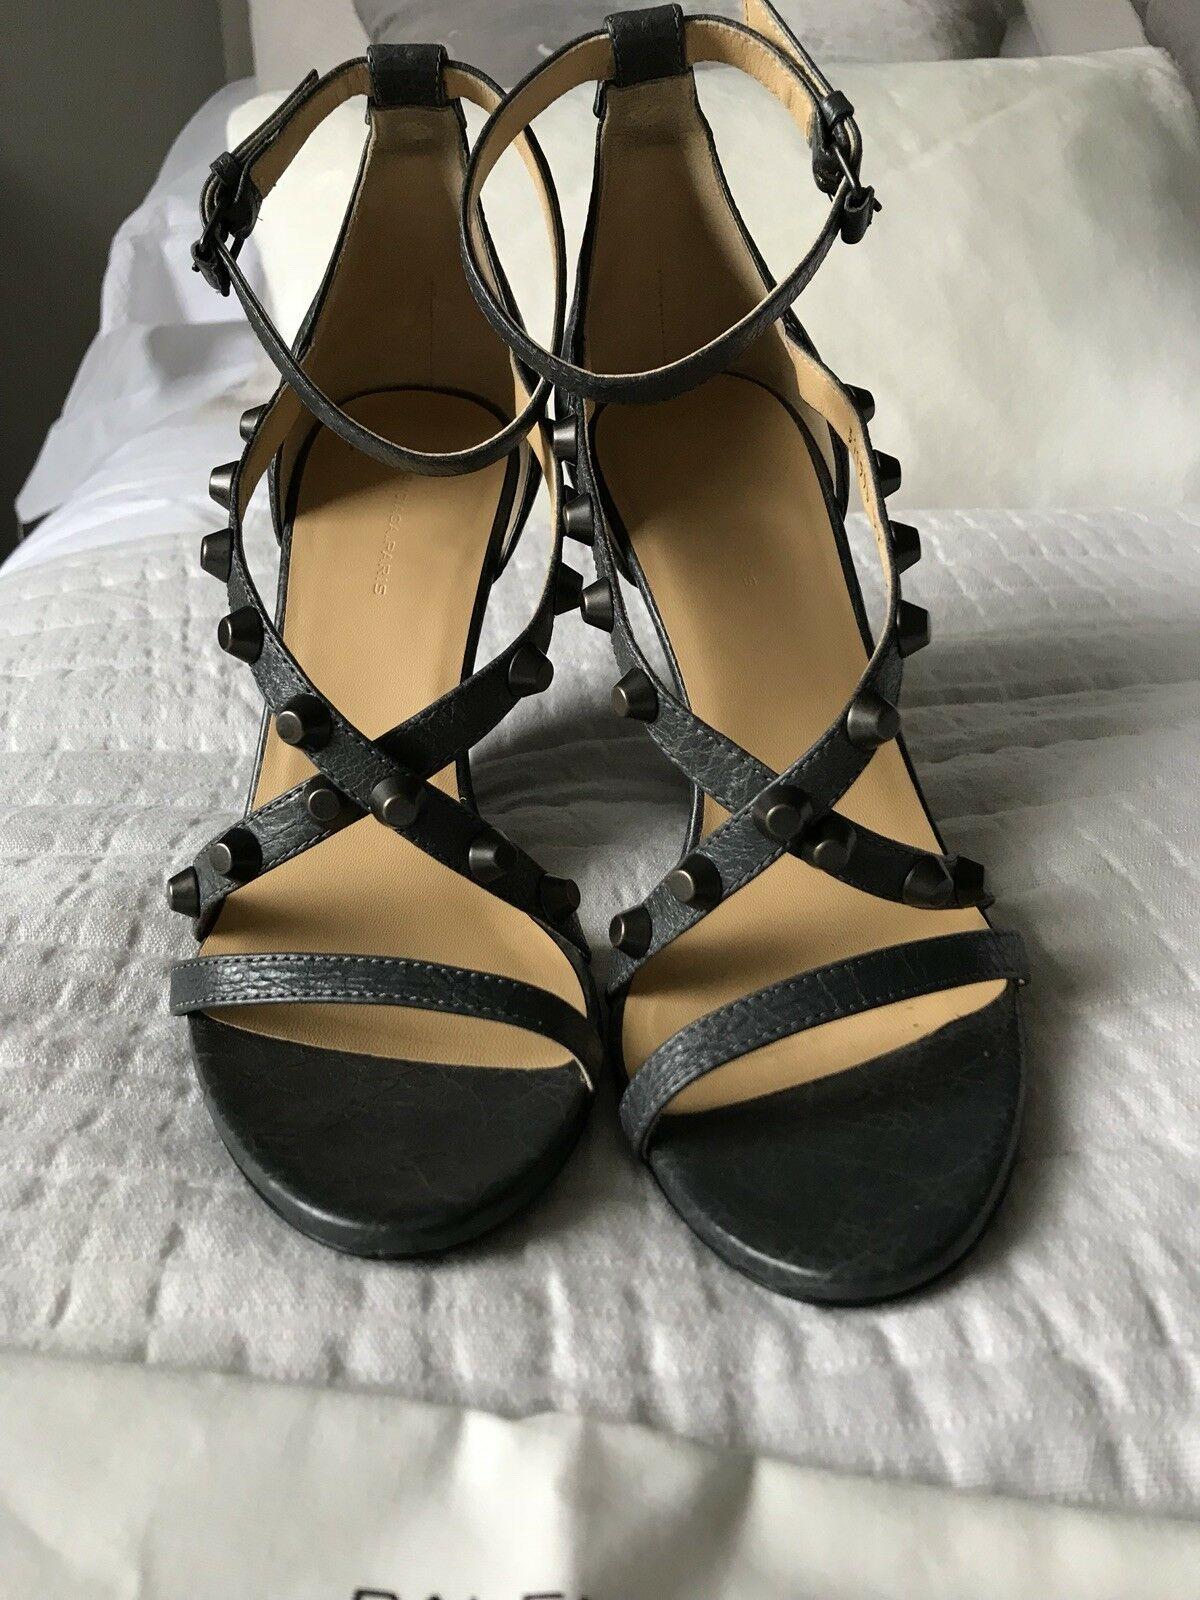 Balenciaga leather gris cloutées sandals with wedge UK 39 excellent condition